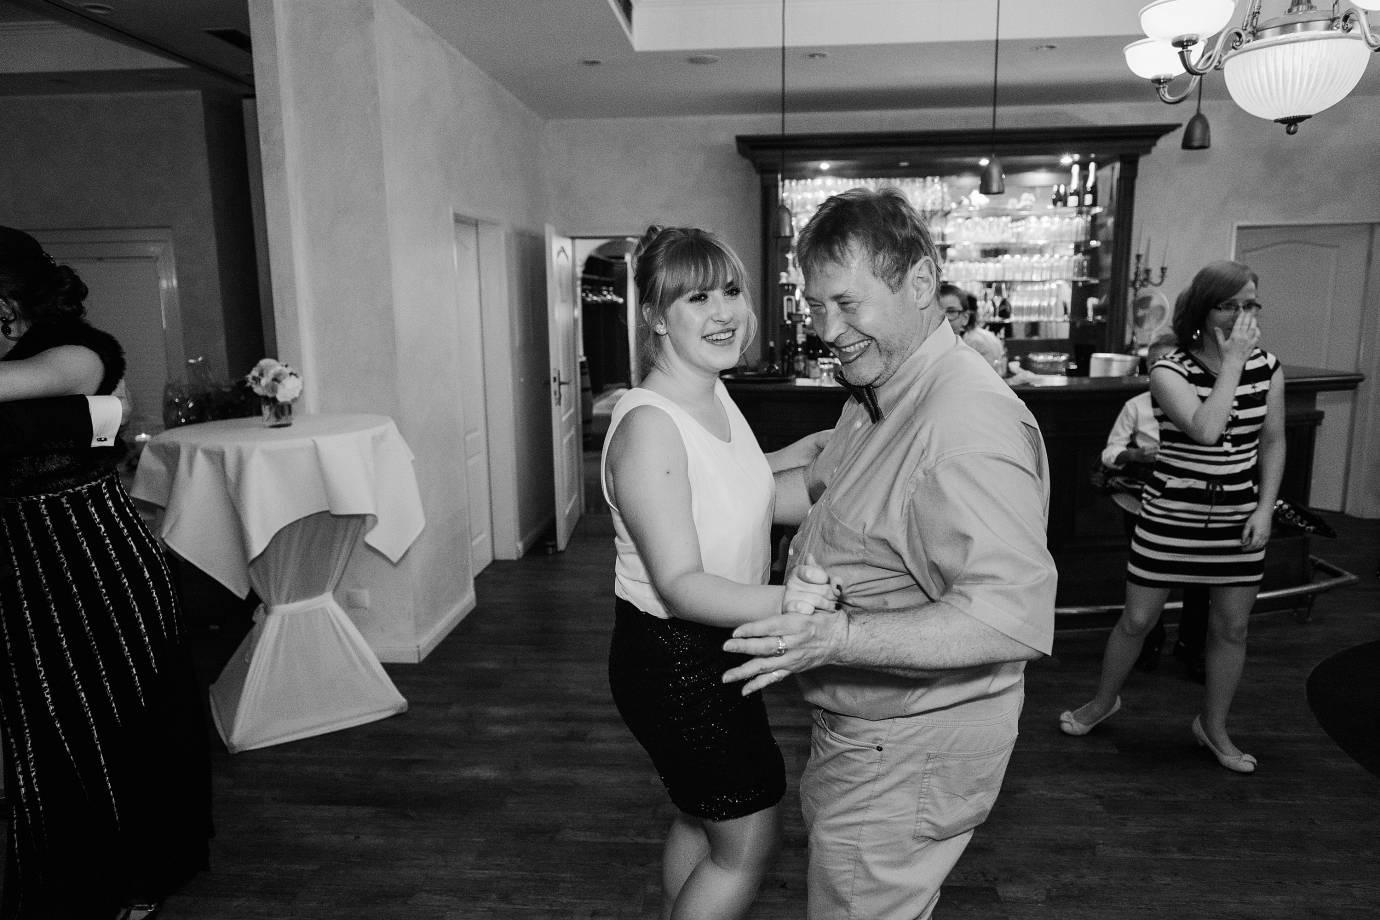 hochzeitsfotograf achim 141 - Christina+Peter